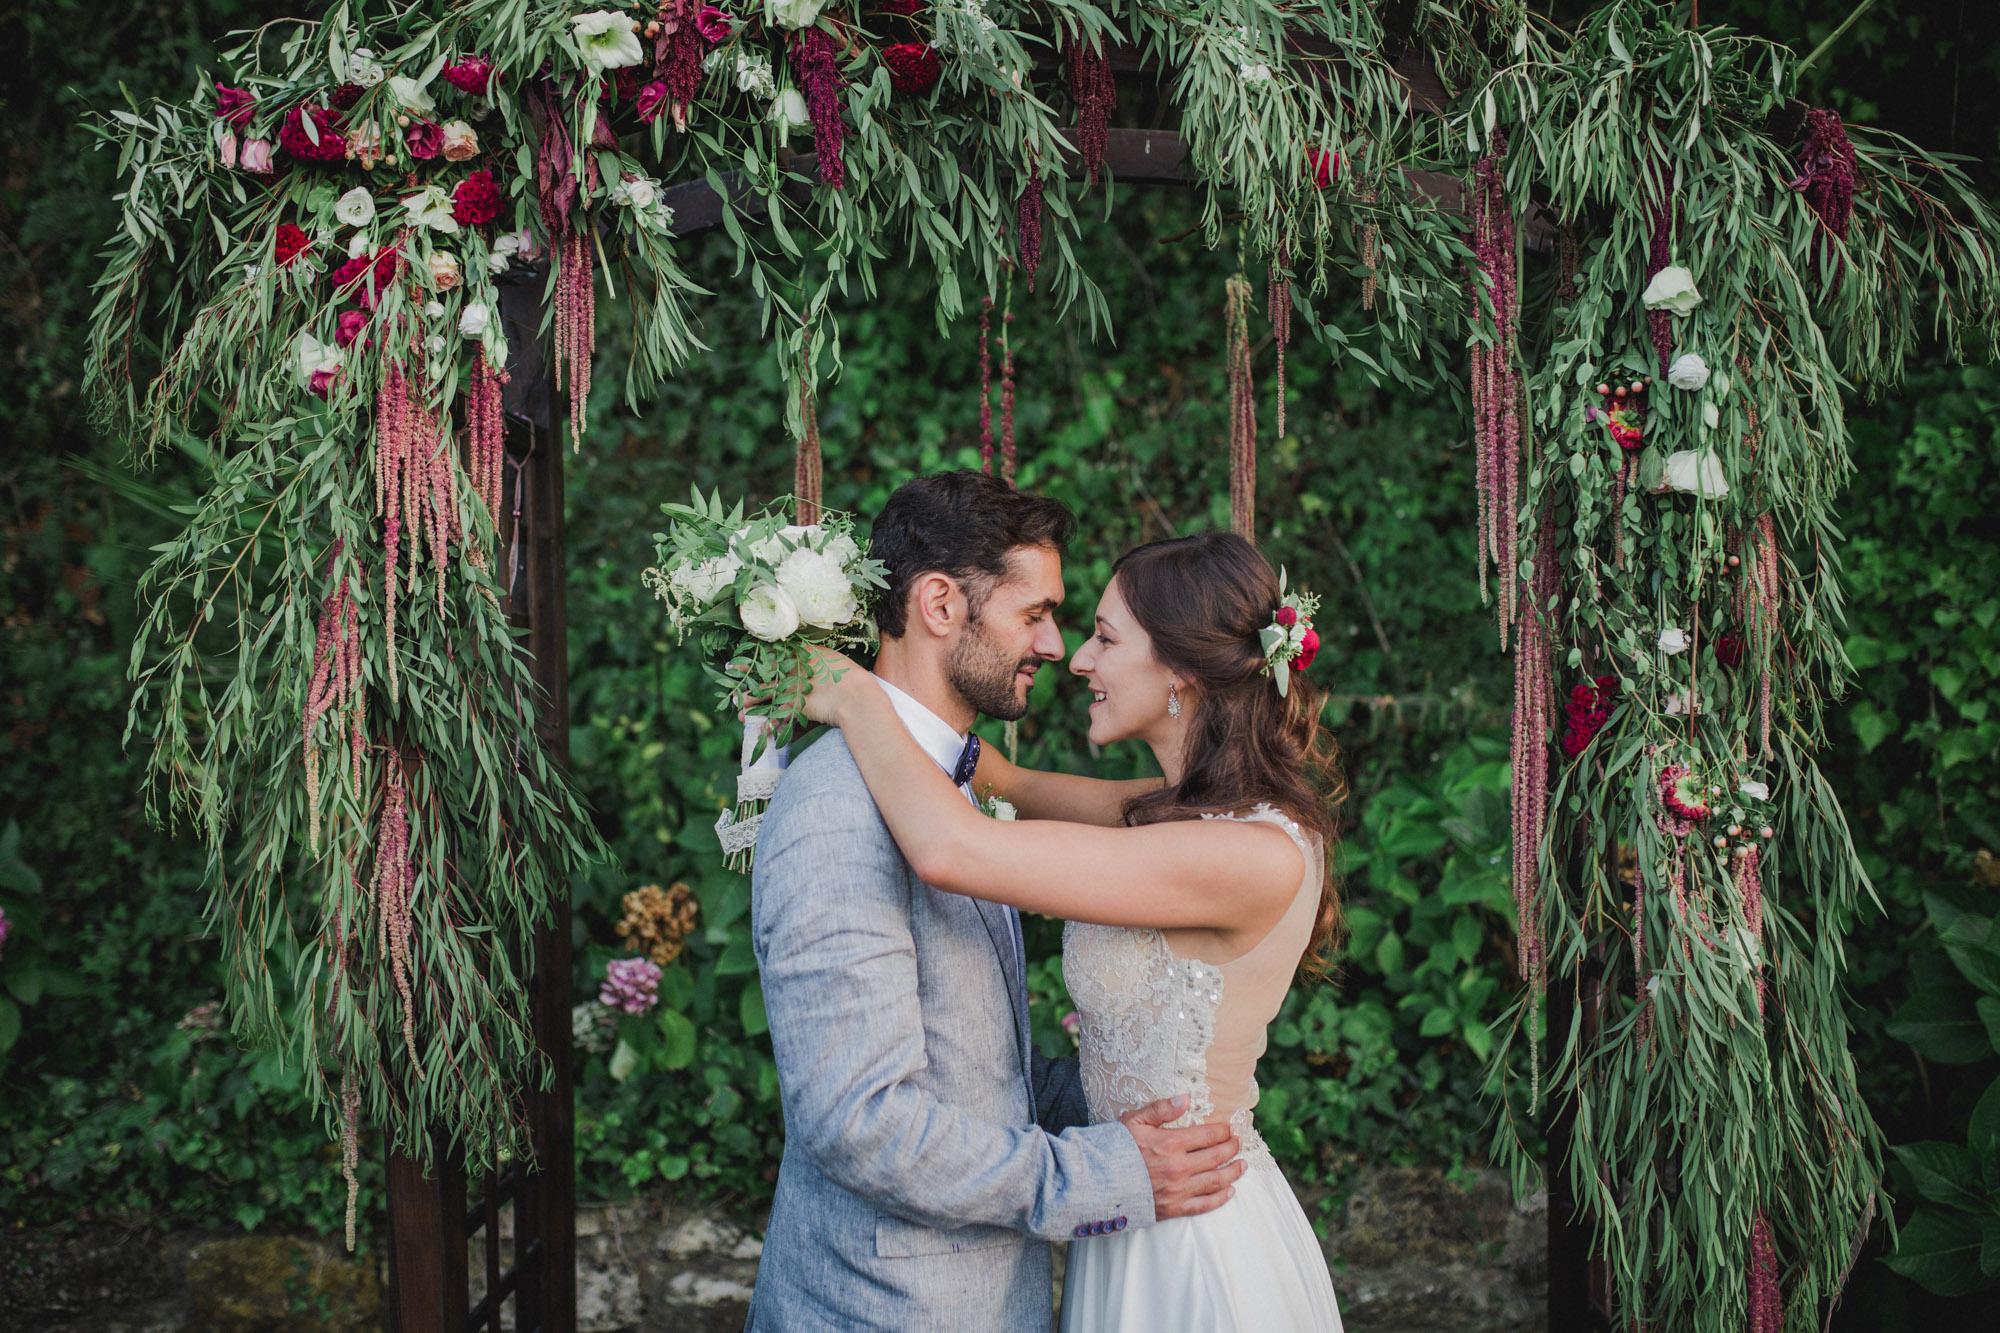 018-carina-e-samuel-wedding-casamento-quinta-dos-rouxinois-rustico-my-fancy-wedding-mafra-malveira-lisboa-sintra-cascais-filipe-santiago-fotografia-fotografo-lifestyle-destination-portugal